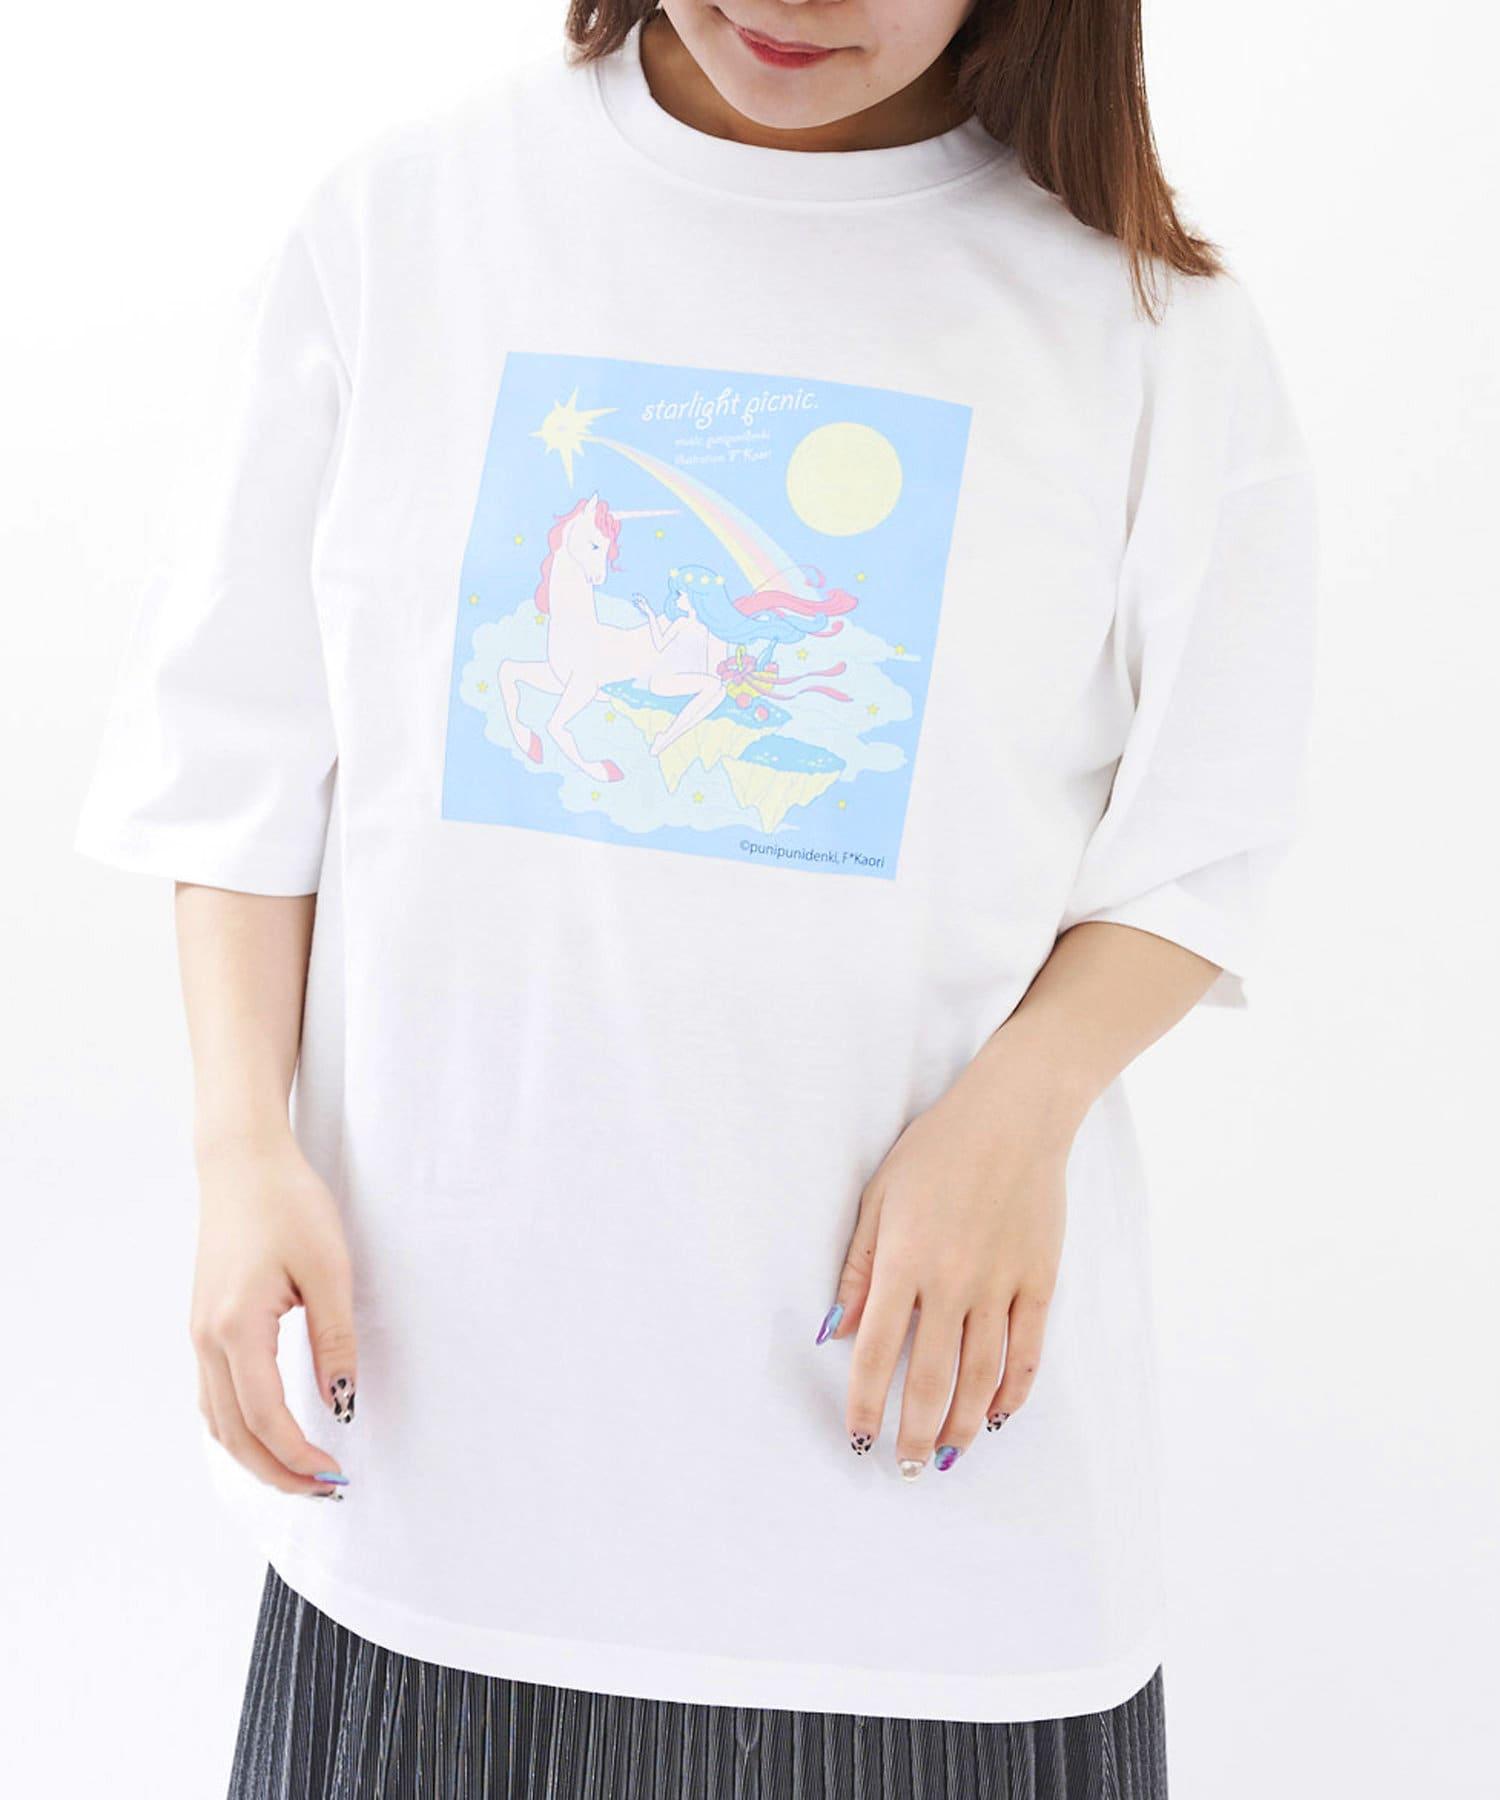 3COINS(スリーコインズ) ライフスタイル 【JUKEBOX PROJECT】AWATシャツ その他4